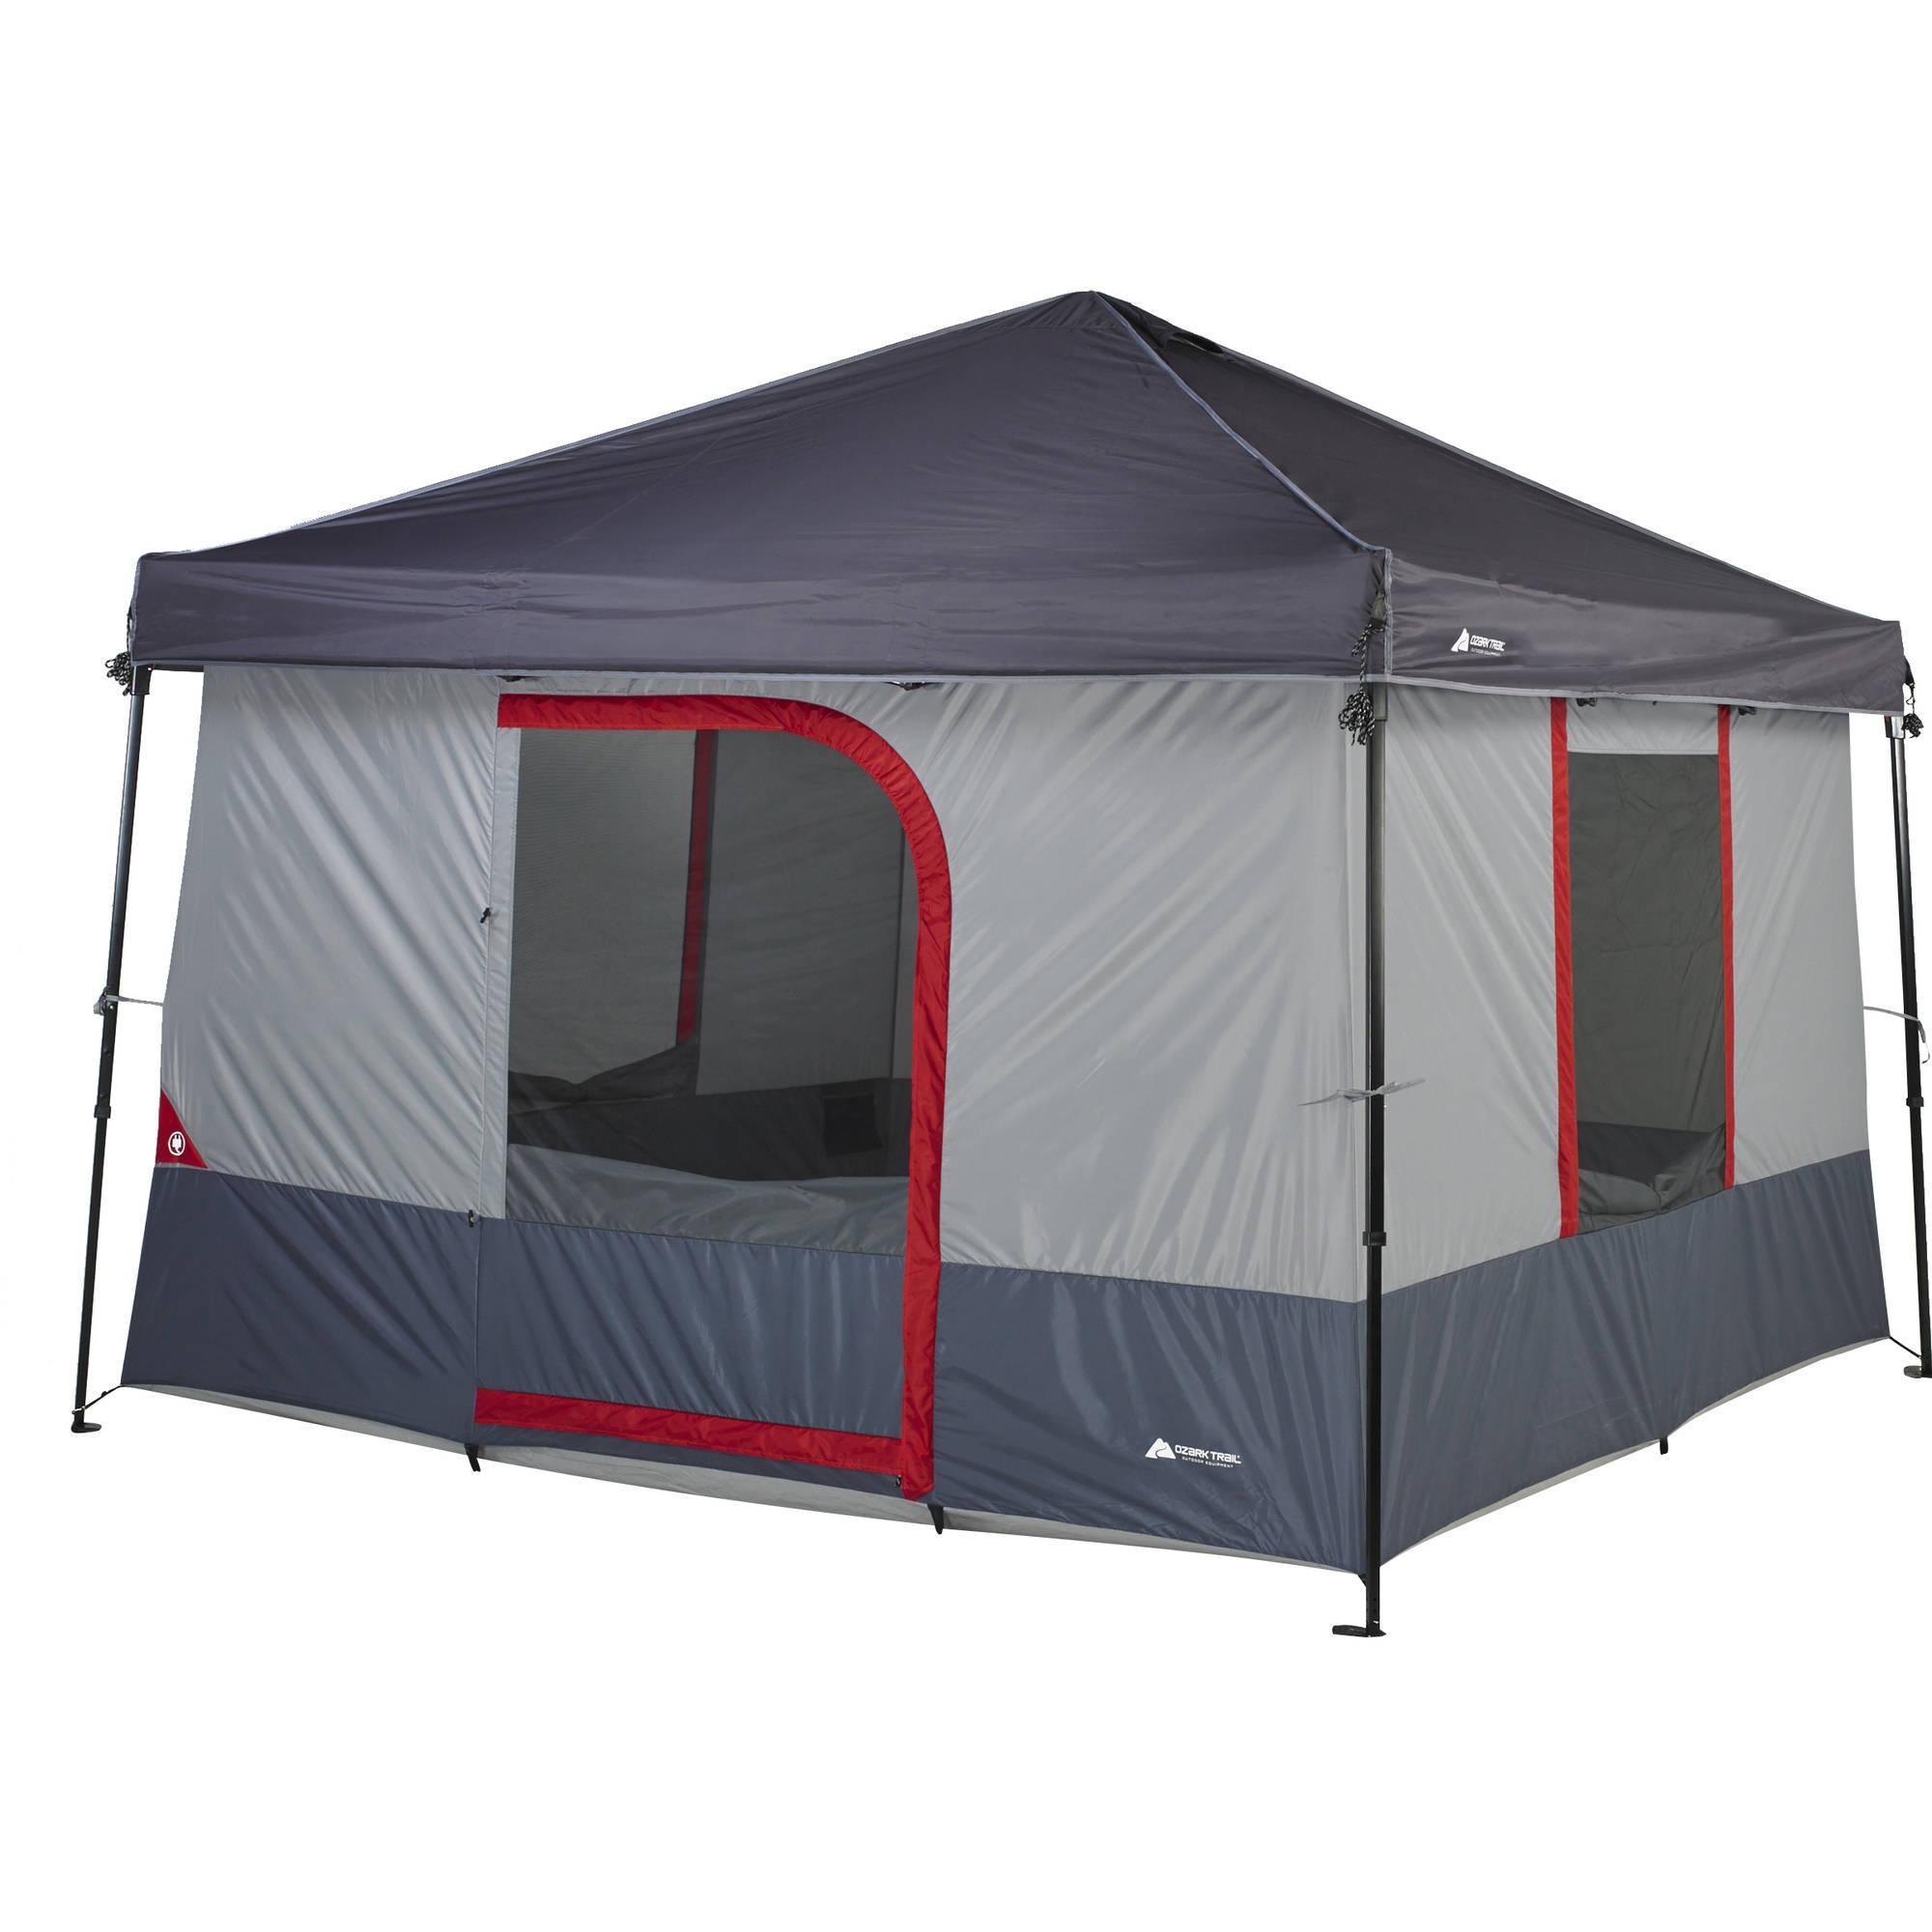 Benifits of having canopy tent